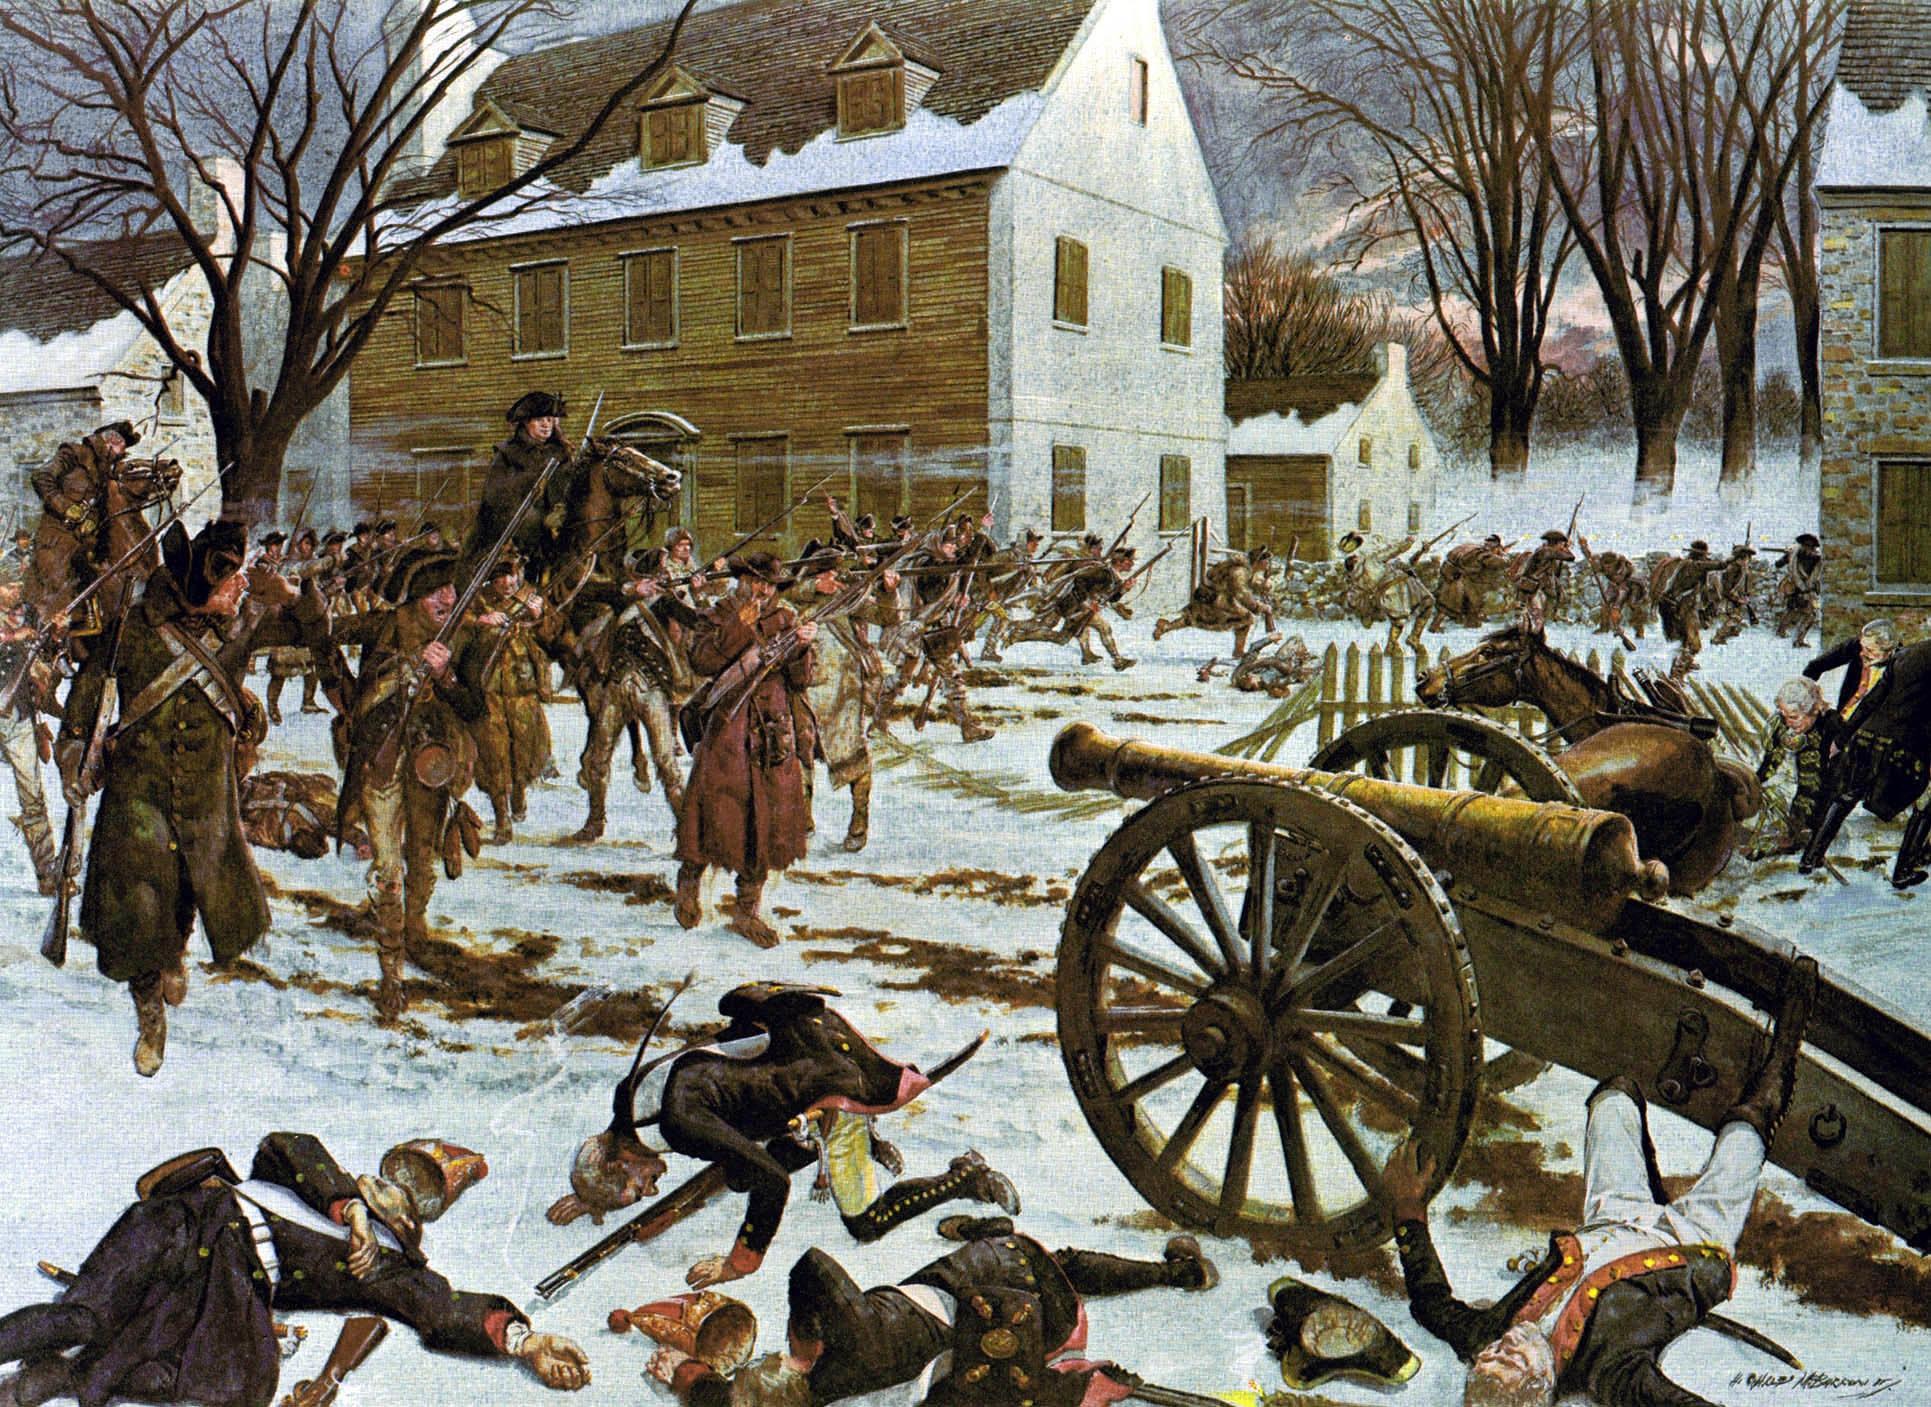 Battle_of_Trenton_by_Charles_McBarron